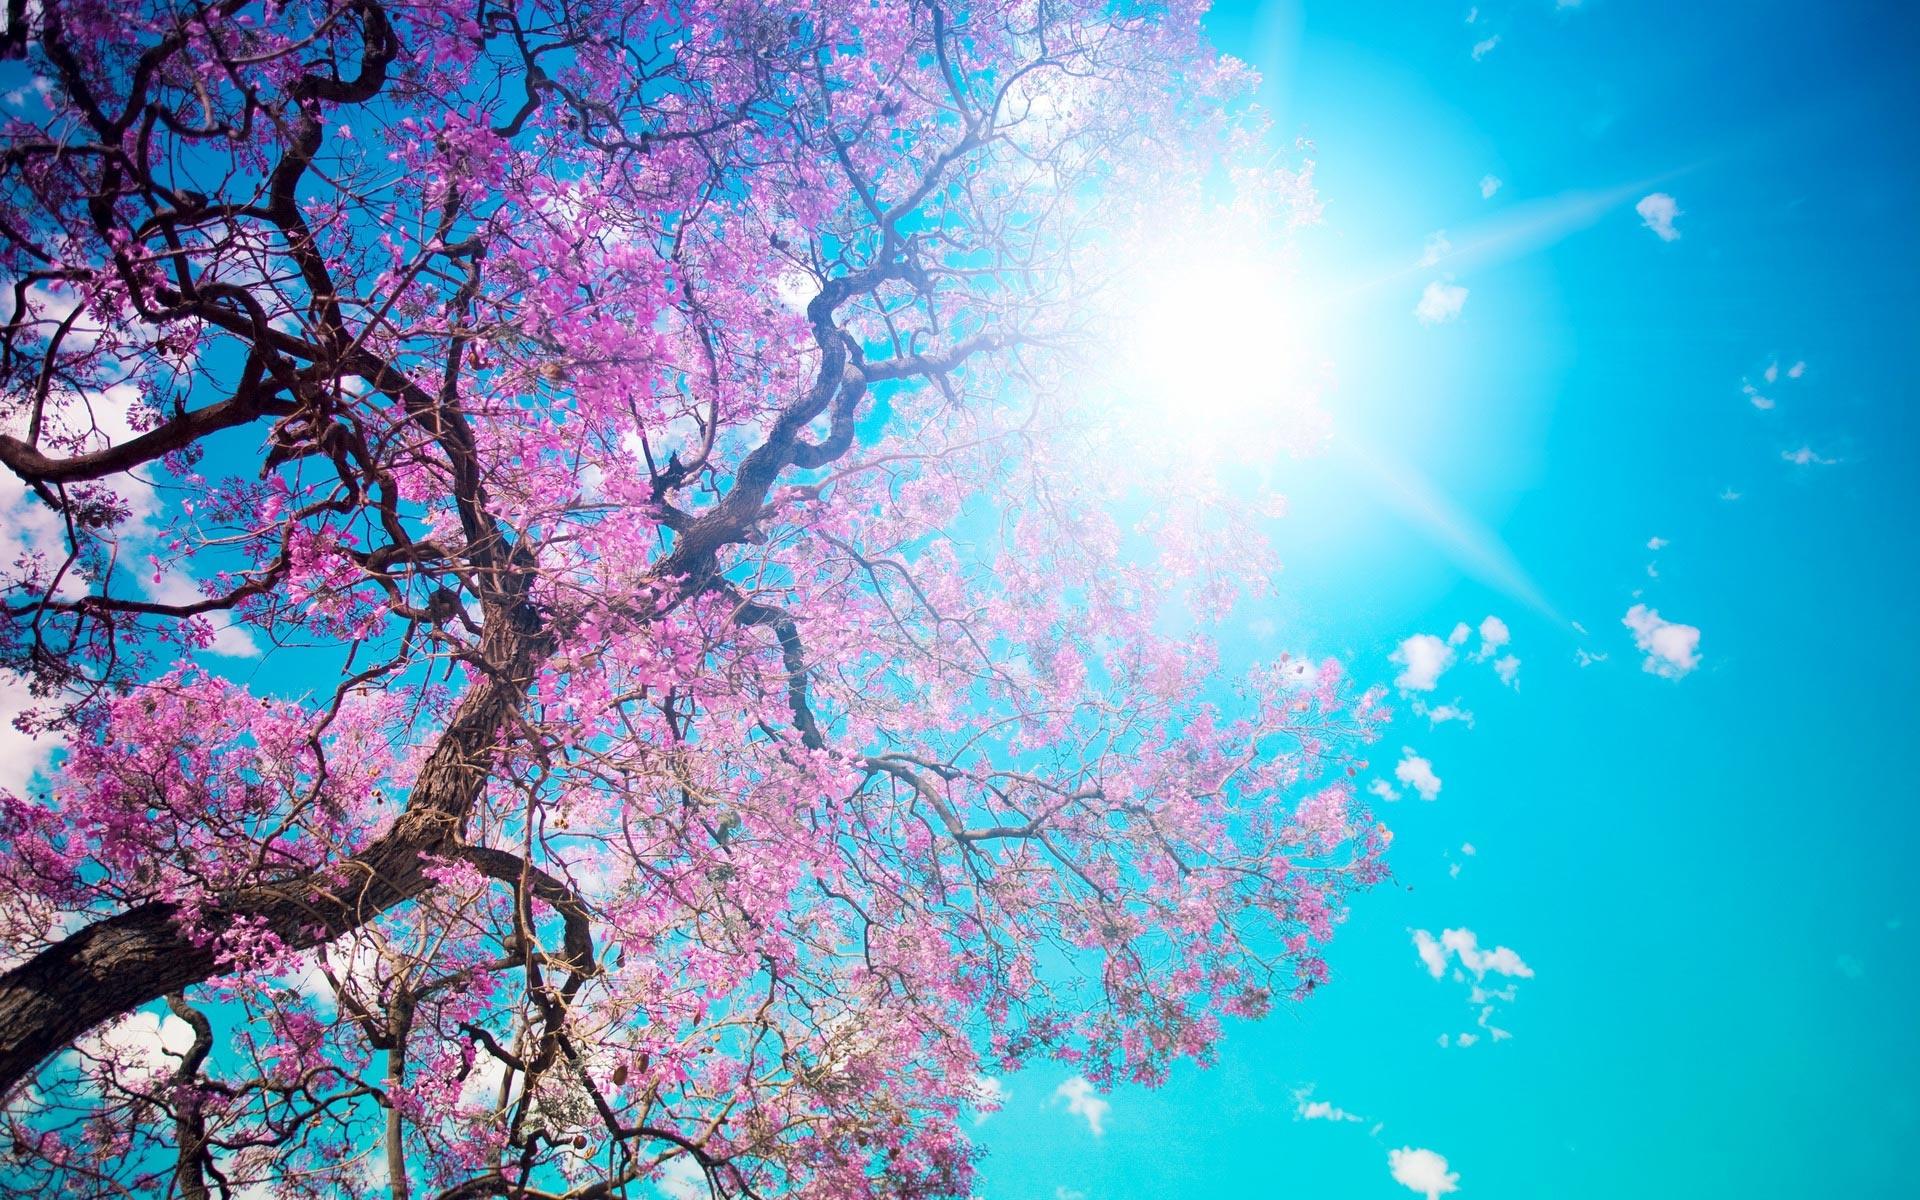 Blooming_spring